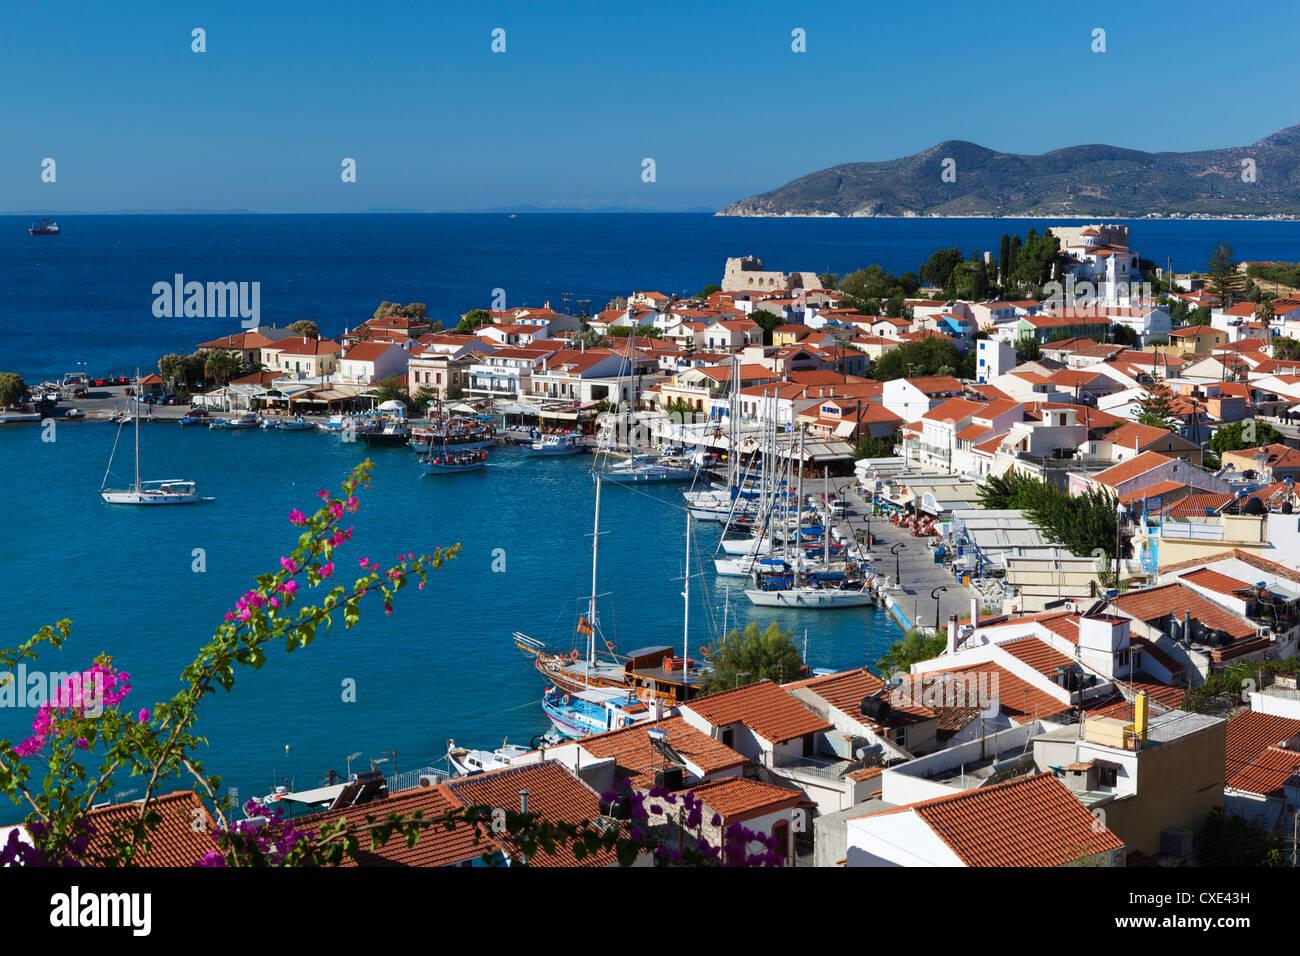 Harbour view, Pythagorion, Samos, Aegean Islands, Greece Stock Photo